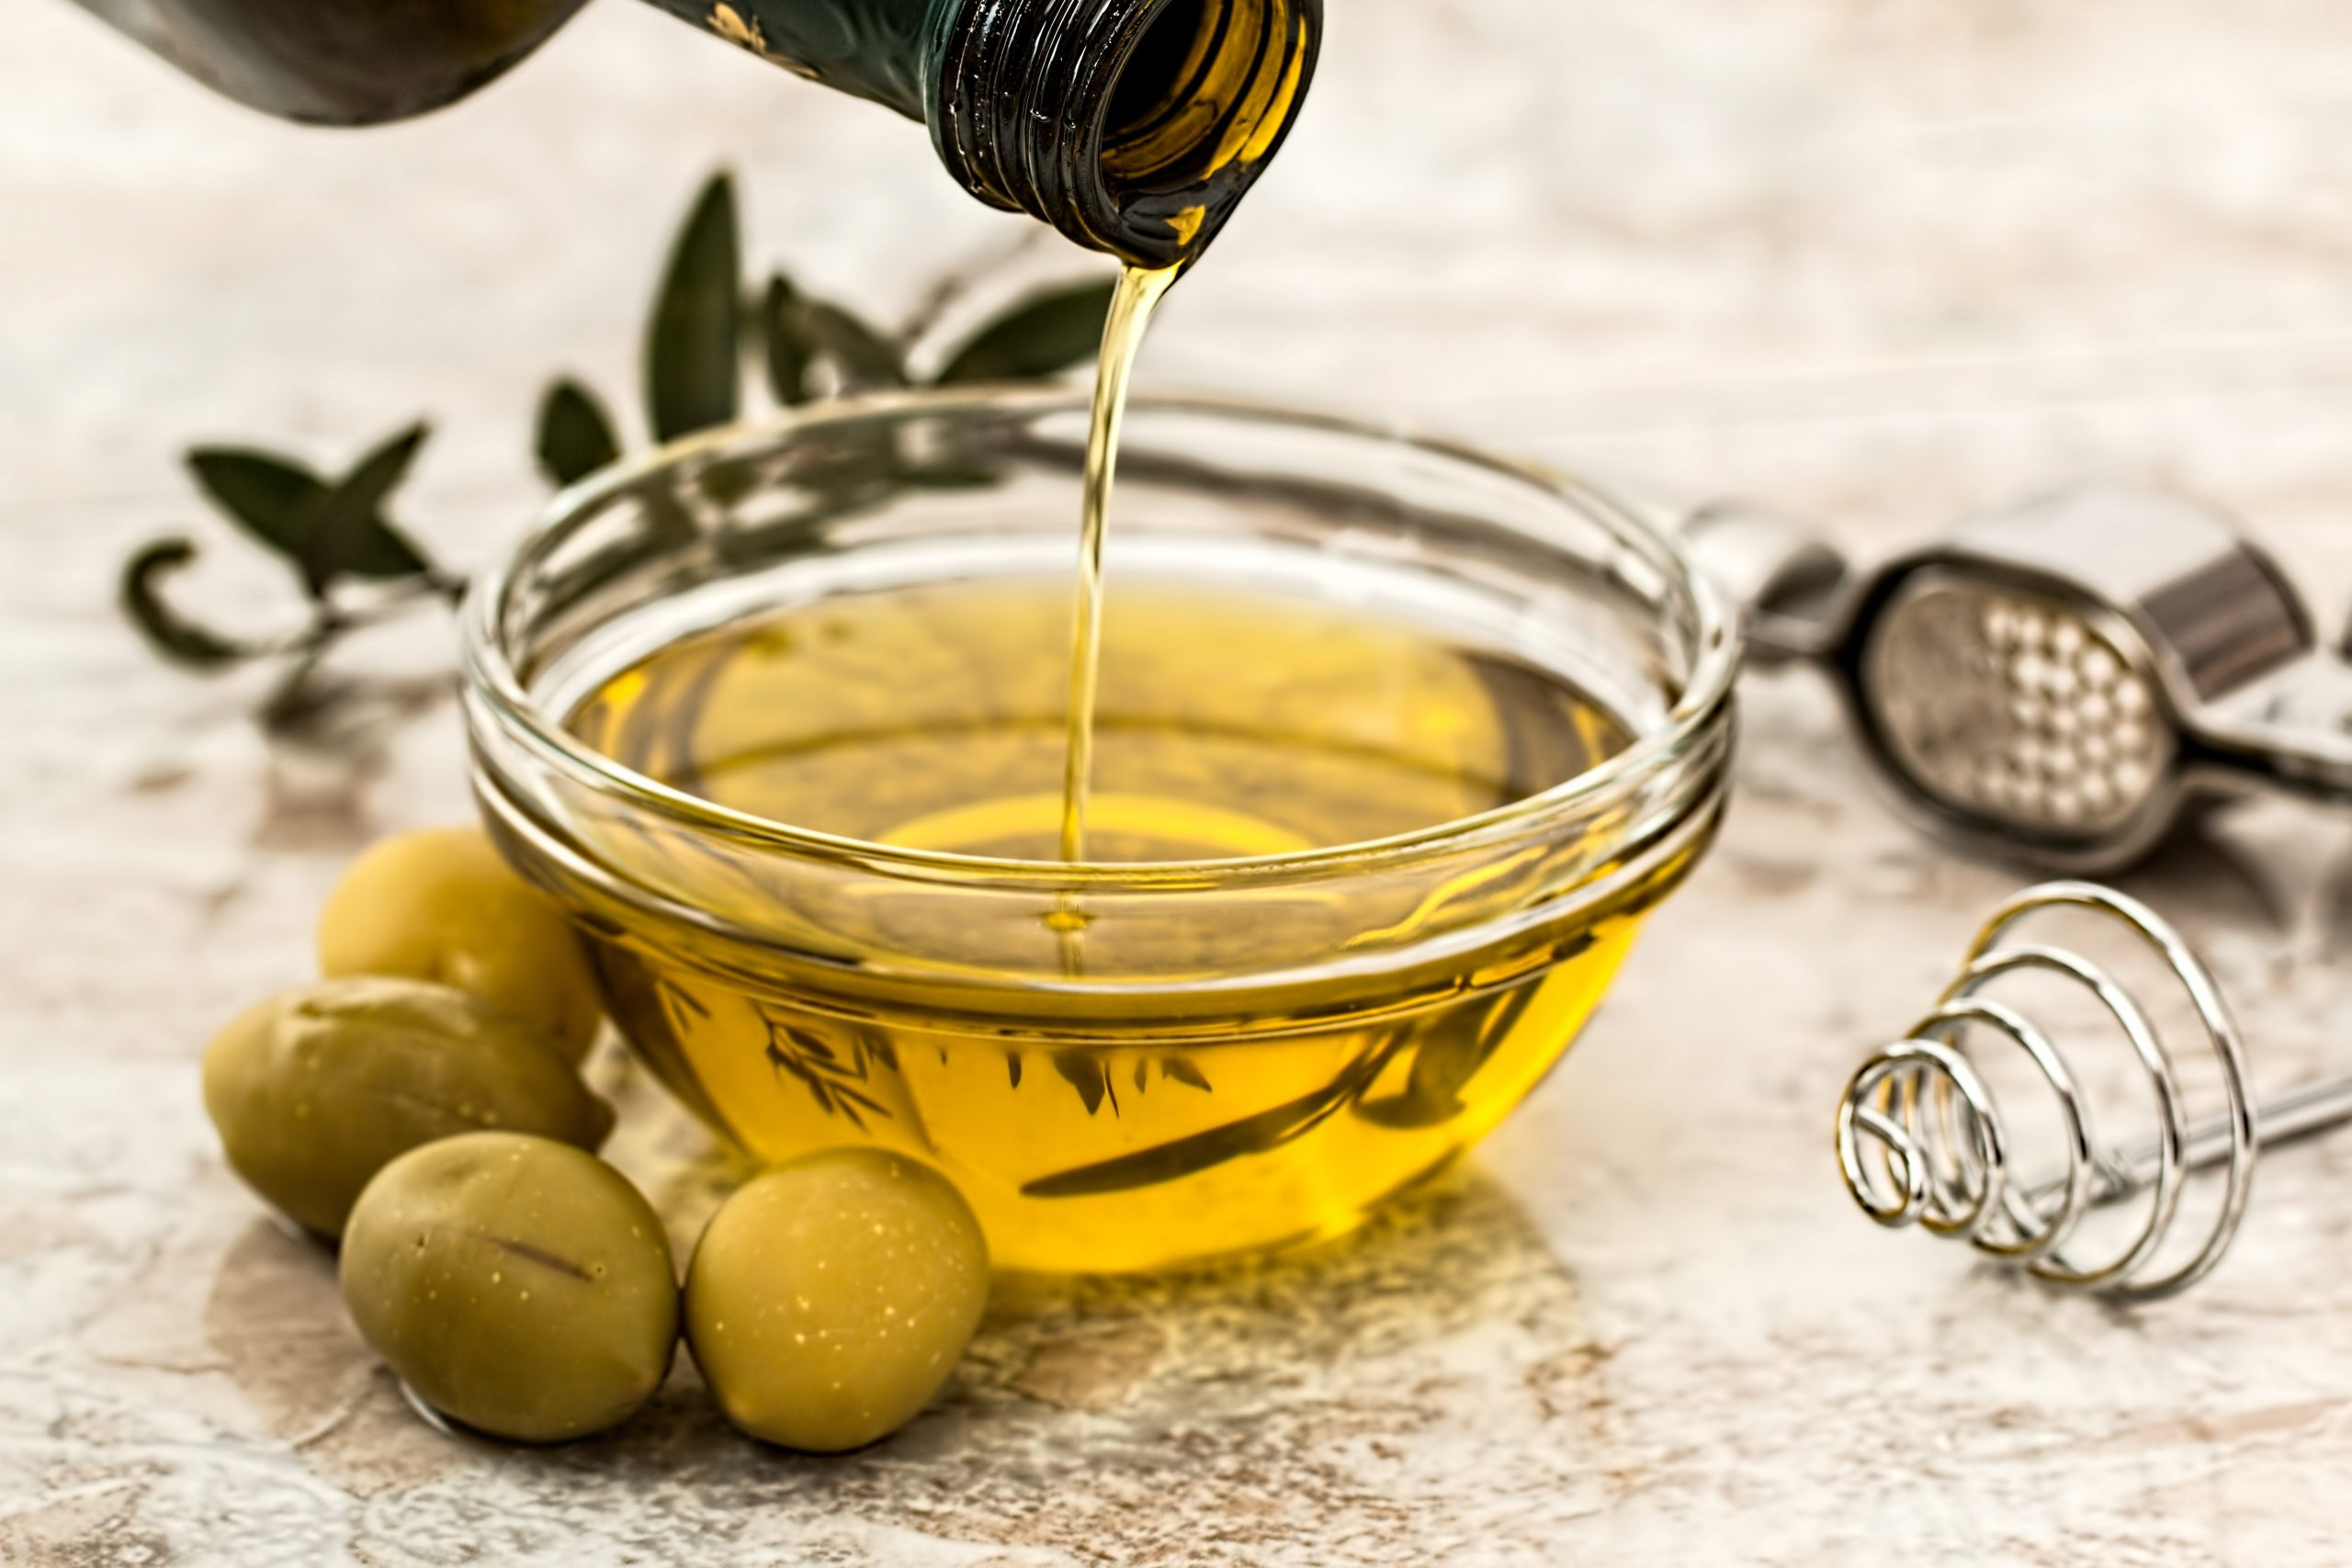 Olio extravergine d'oliva: i migliori prodotti (10/21)